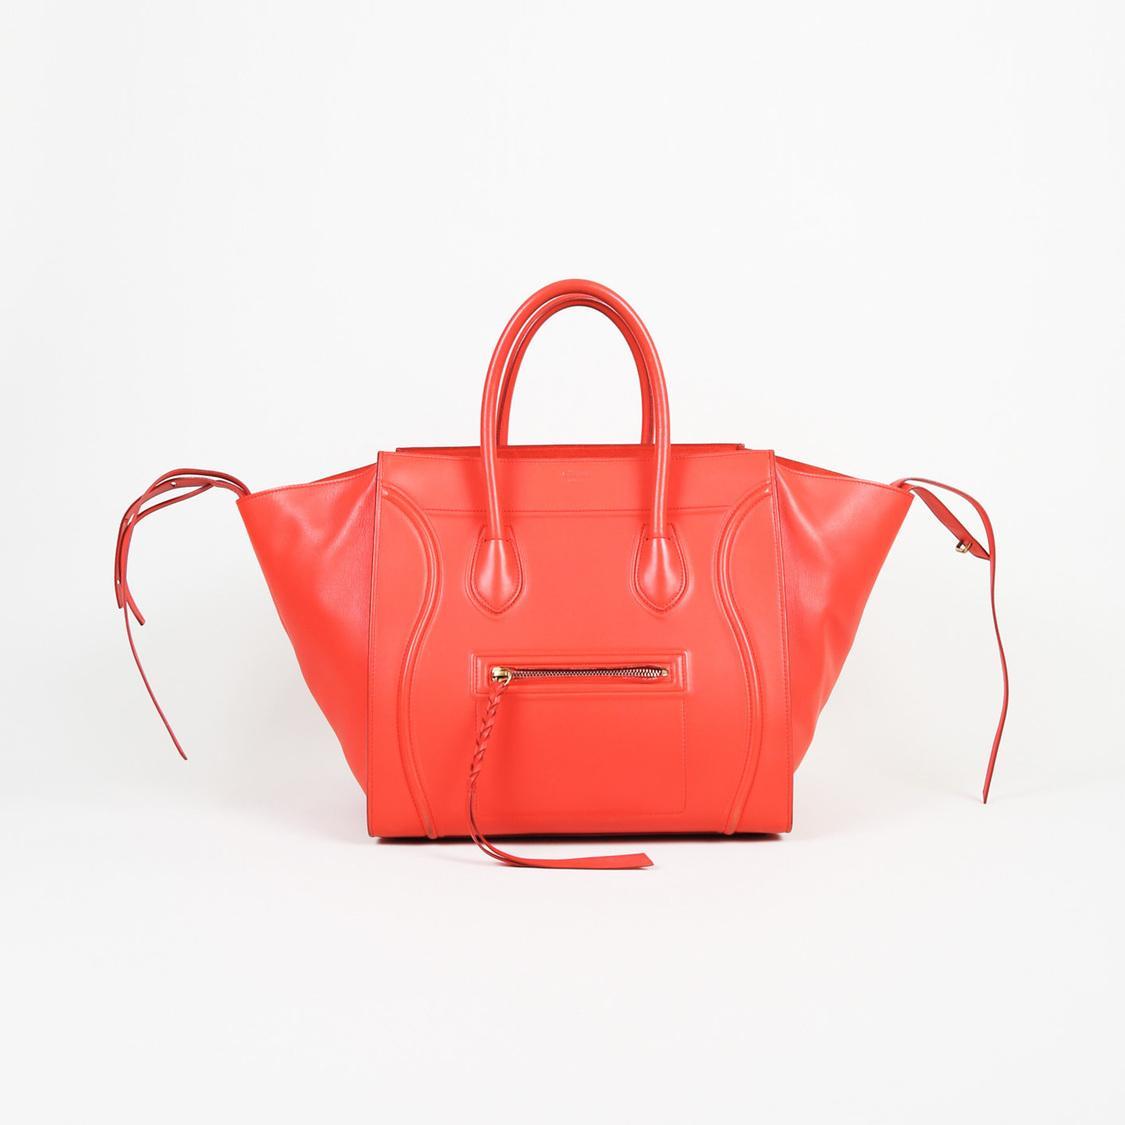 b025140a46 Lyst - Céline Leather Medium